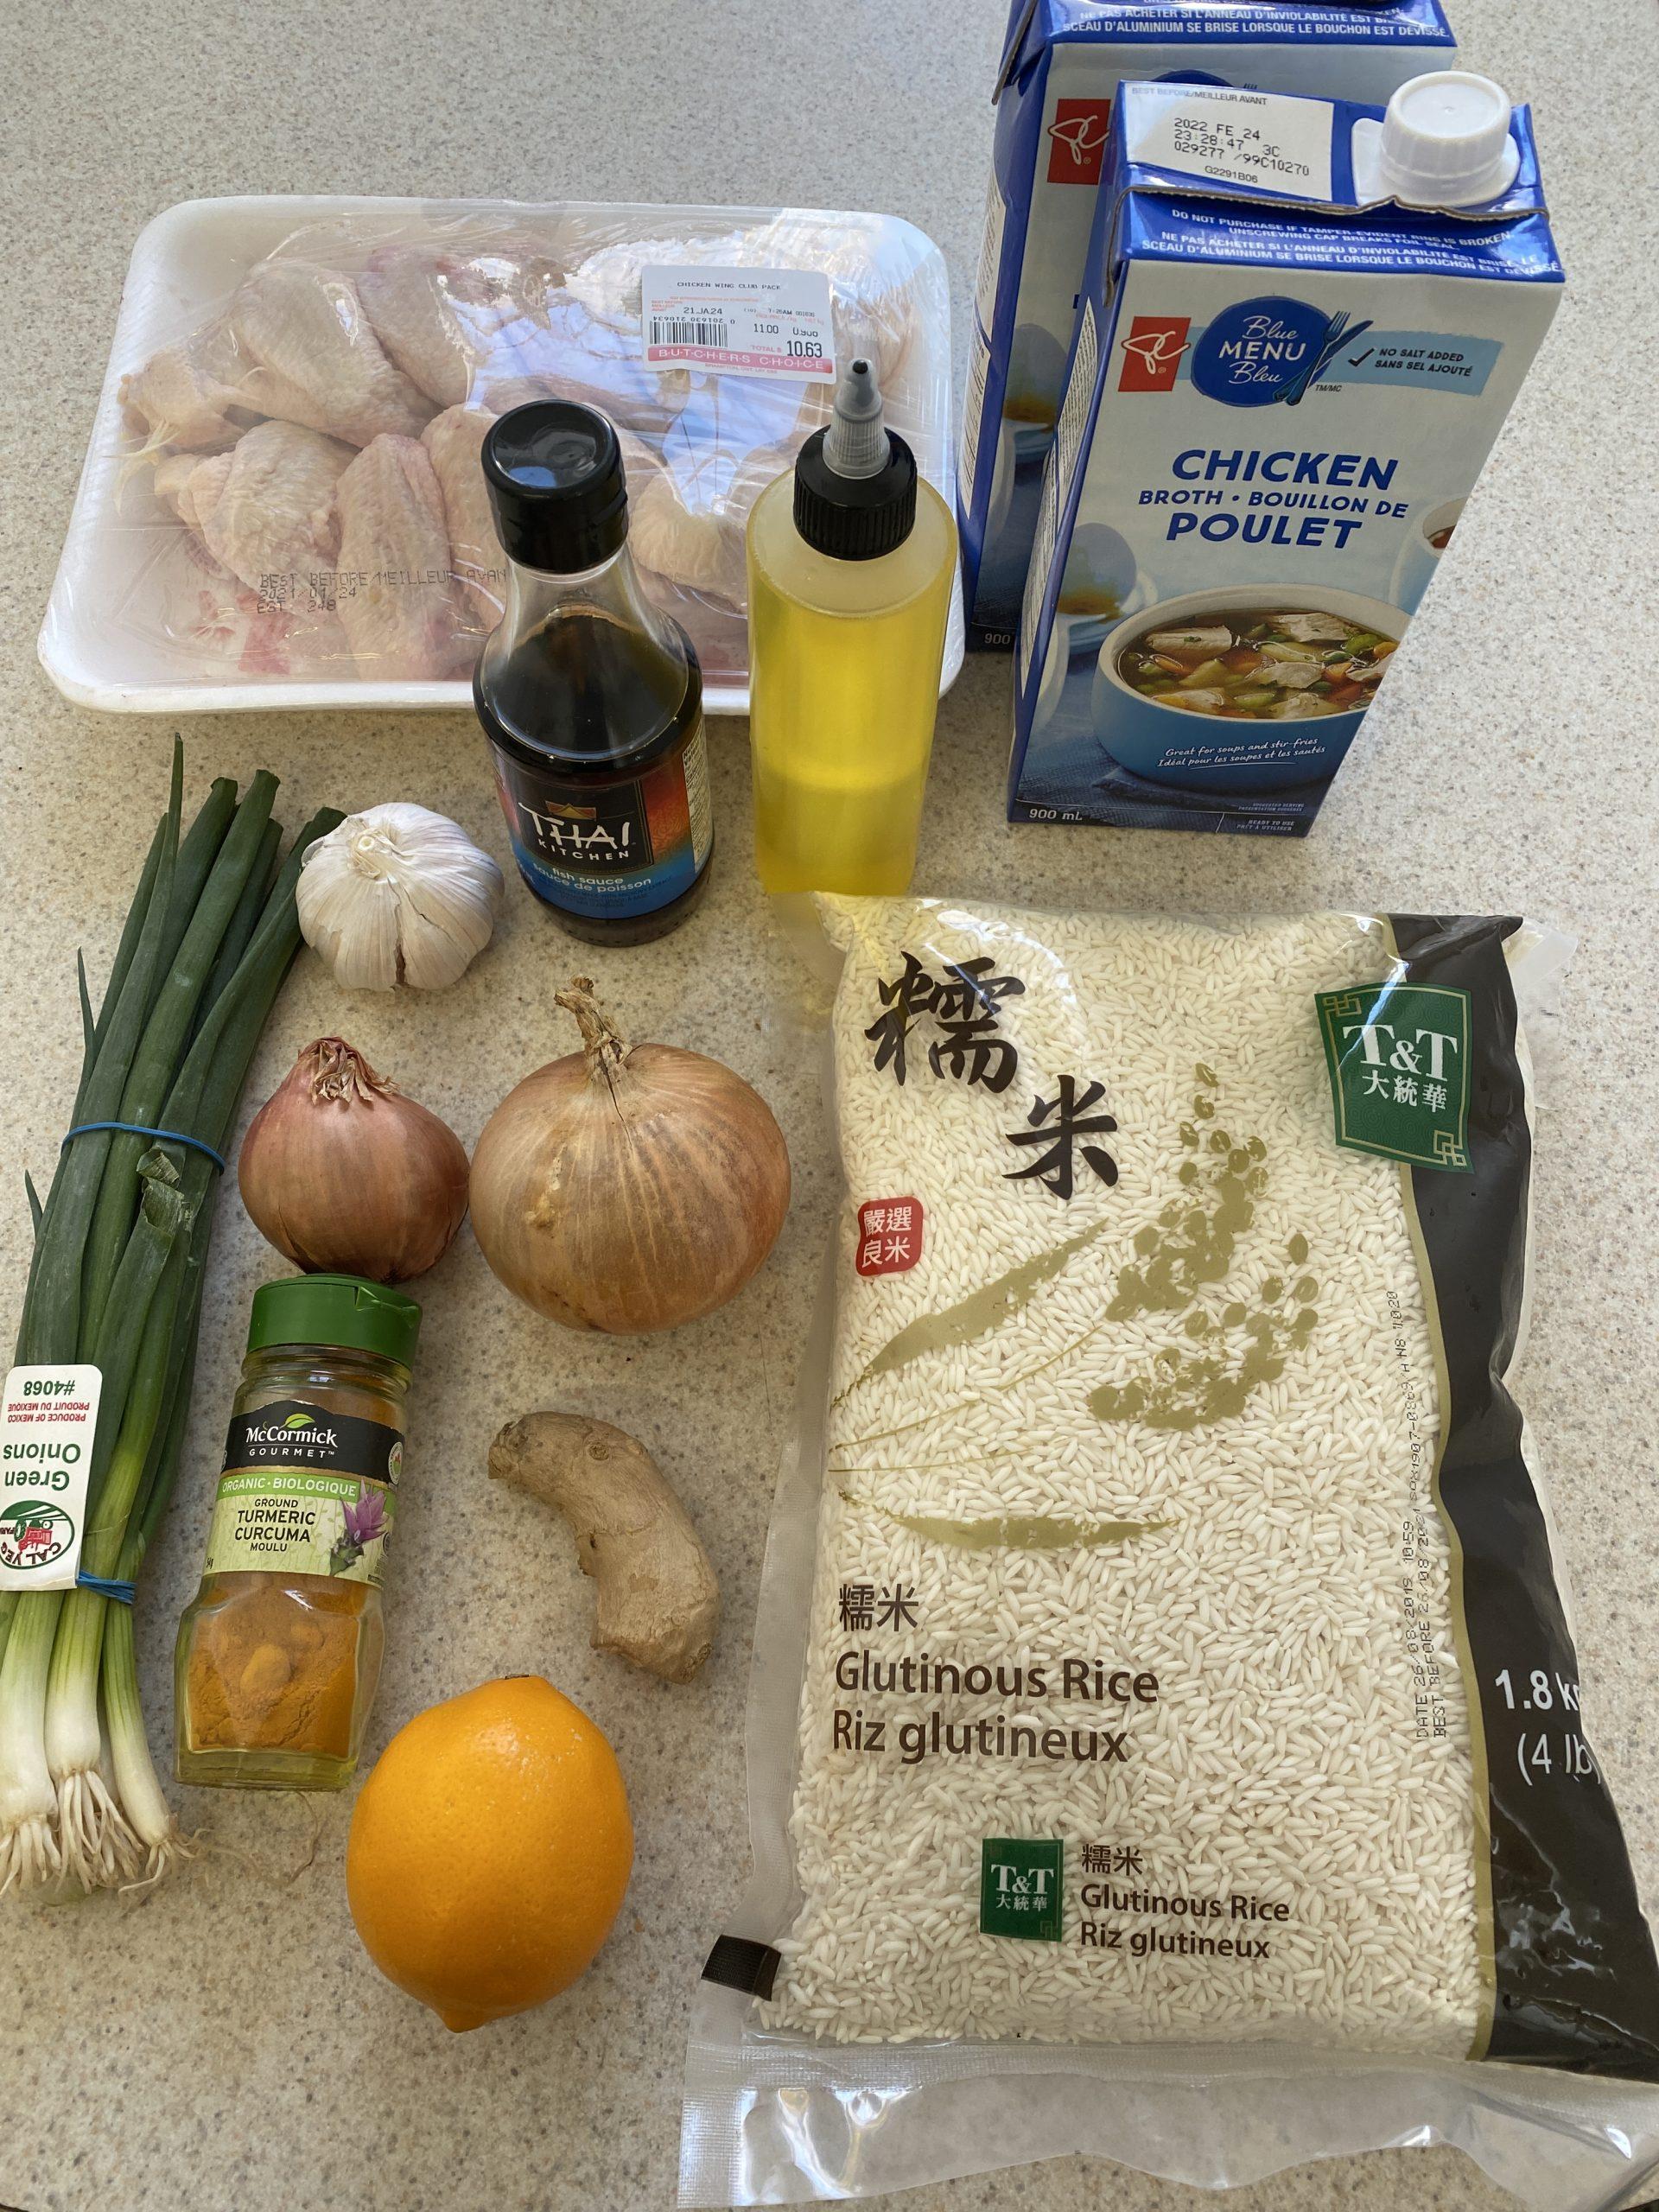 All of the non-prepared ingredients to make the perfect Arroz Caldo recipe